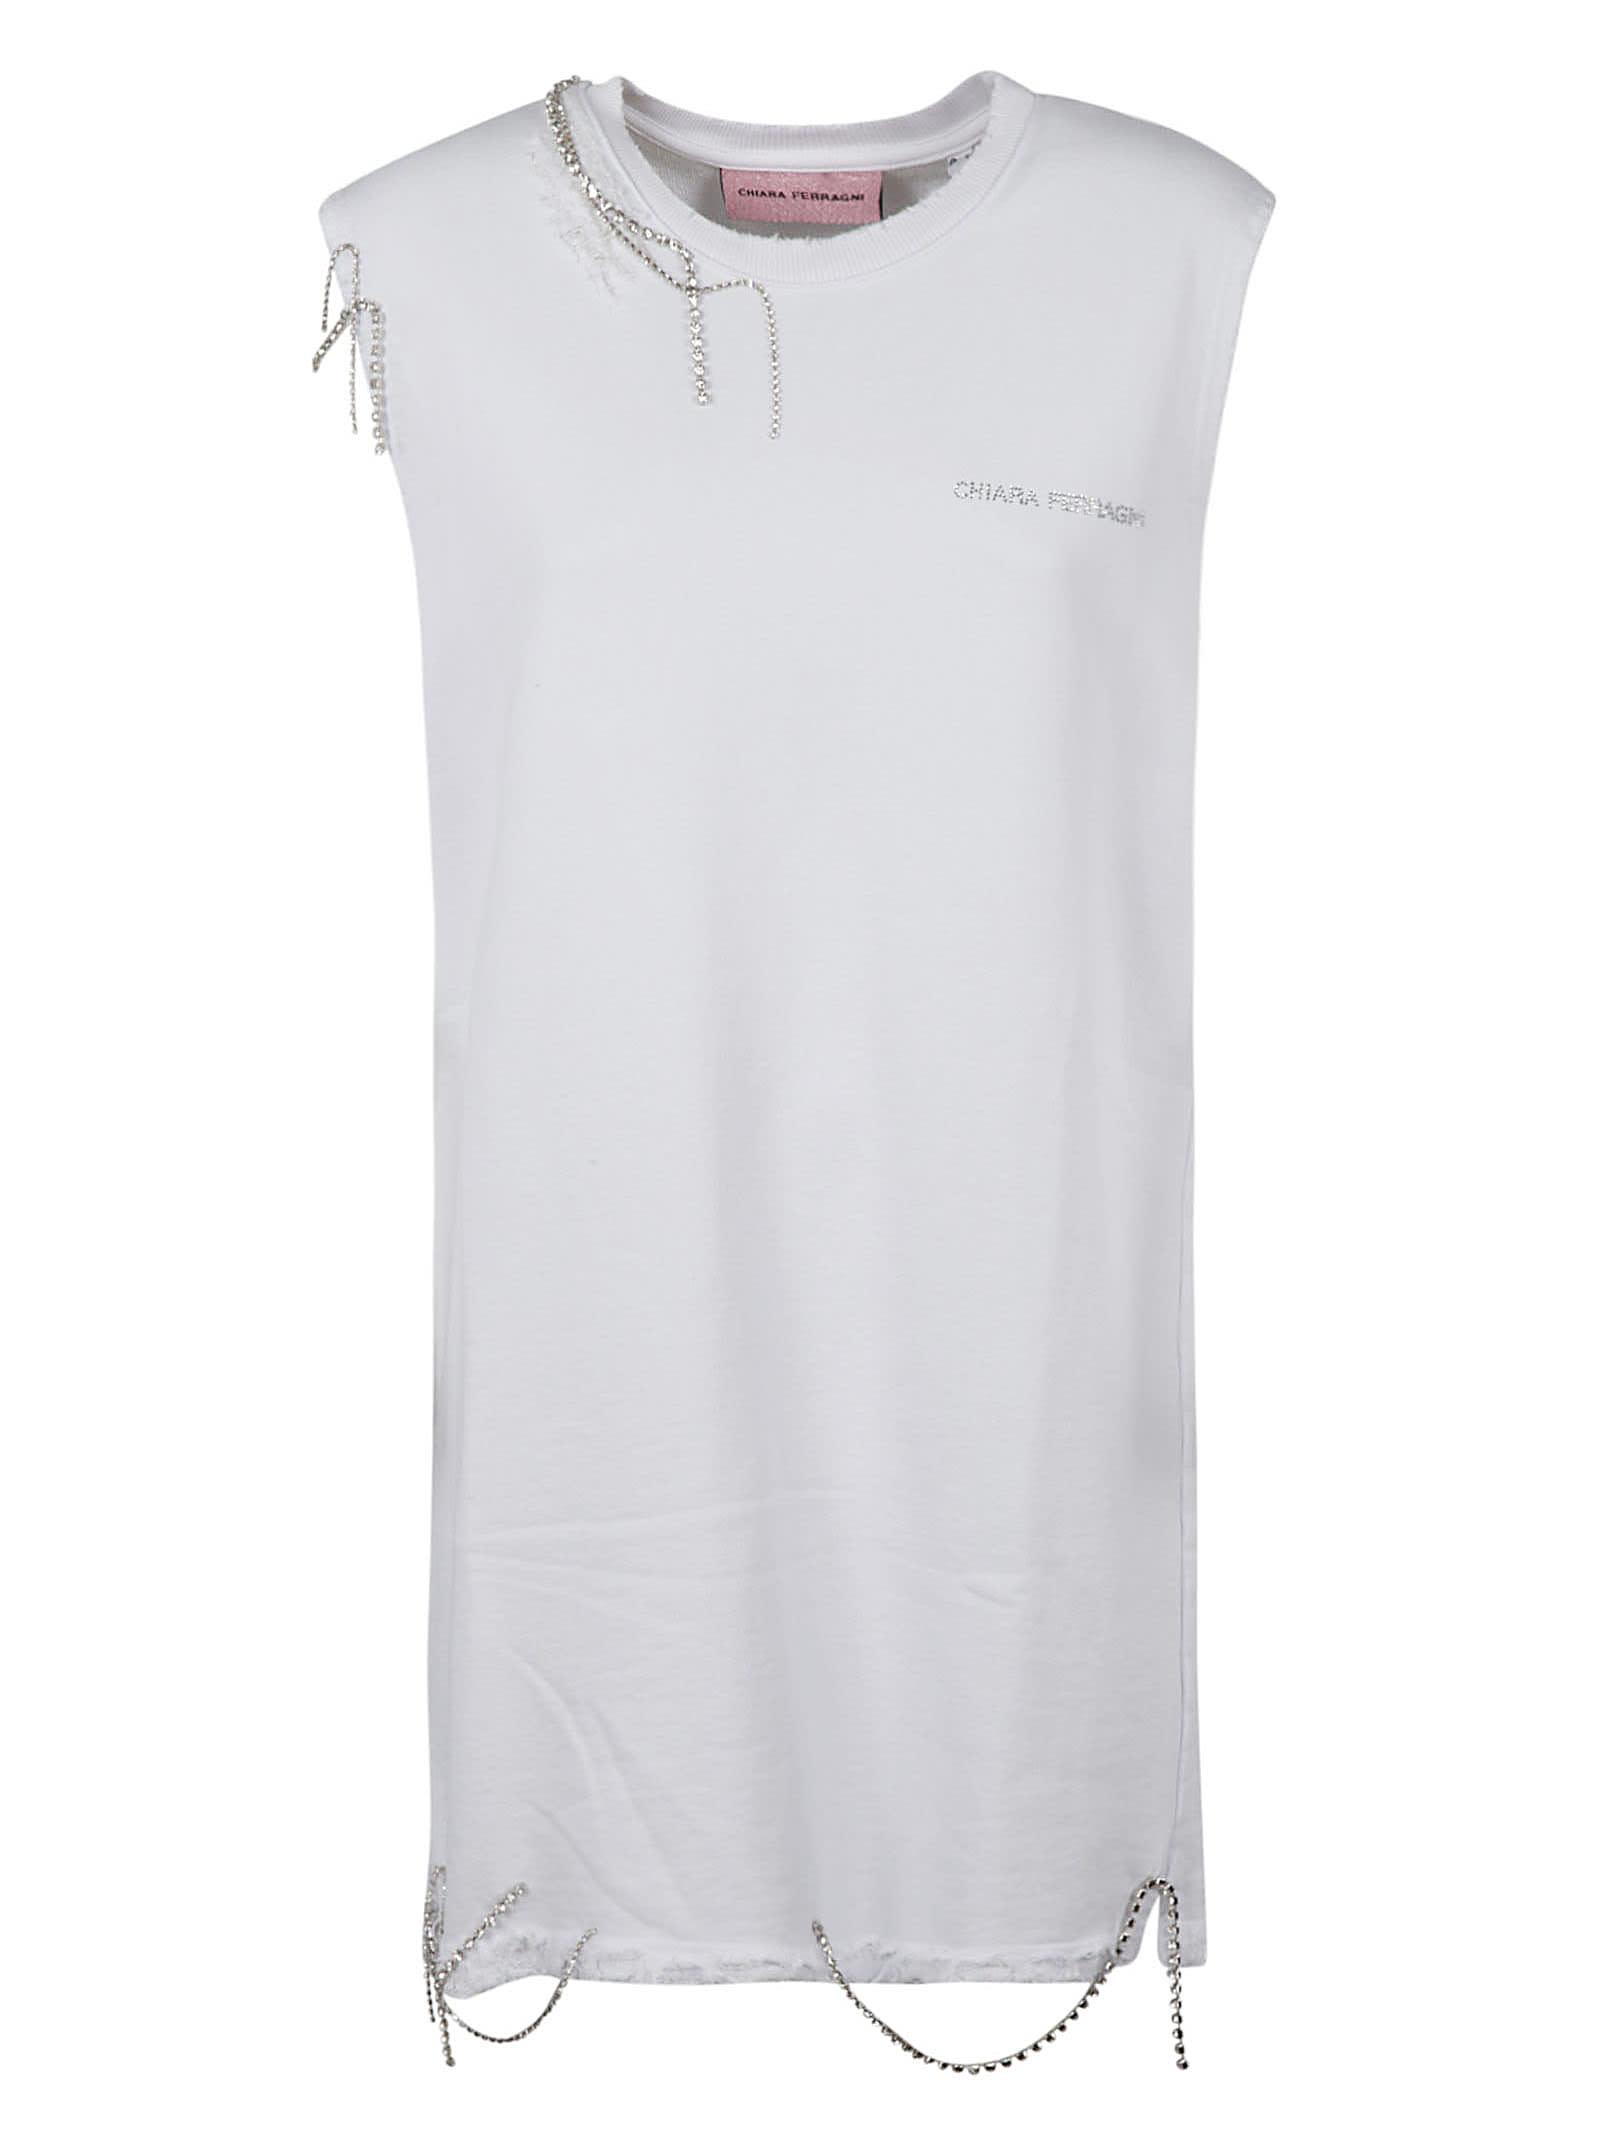 Buy Chiara Ferragni Destroyed Dress online, shop Chiara Ferragni with free shipping